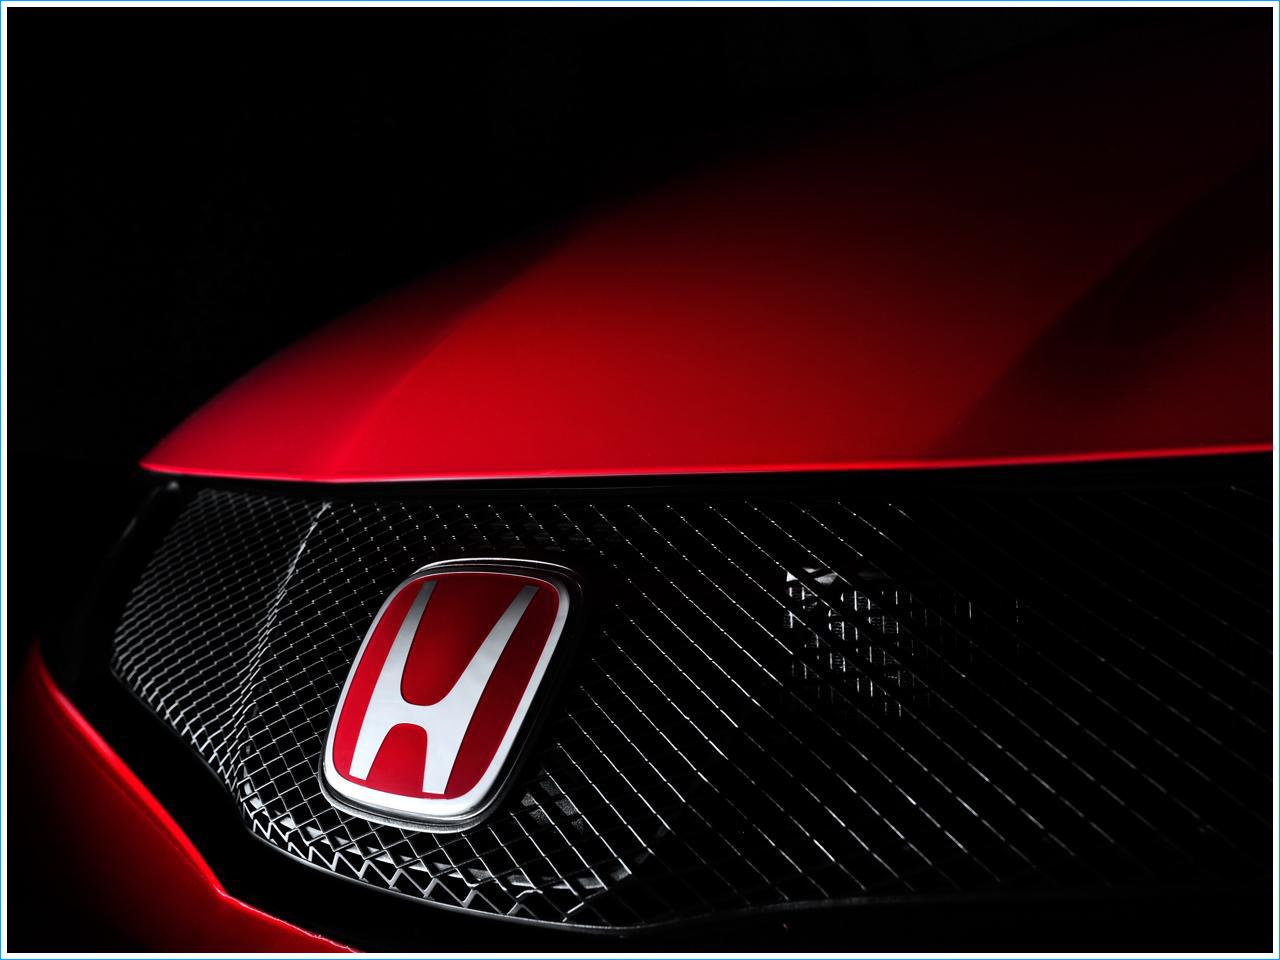 Super Le logo Honda | Les marques de voitures SL34